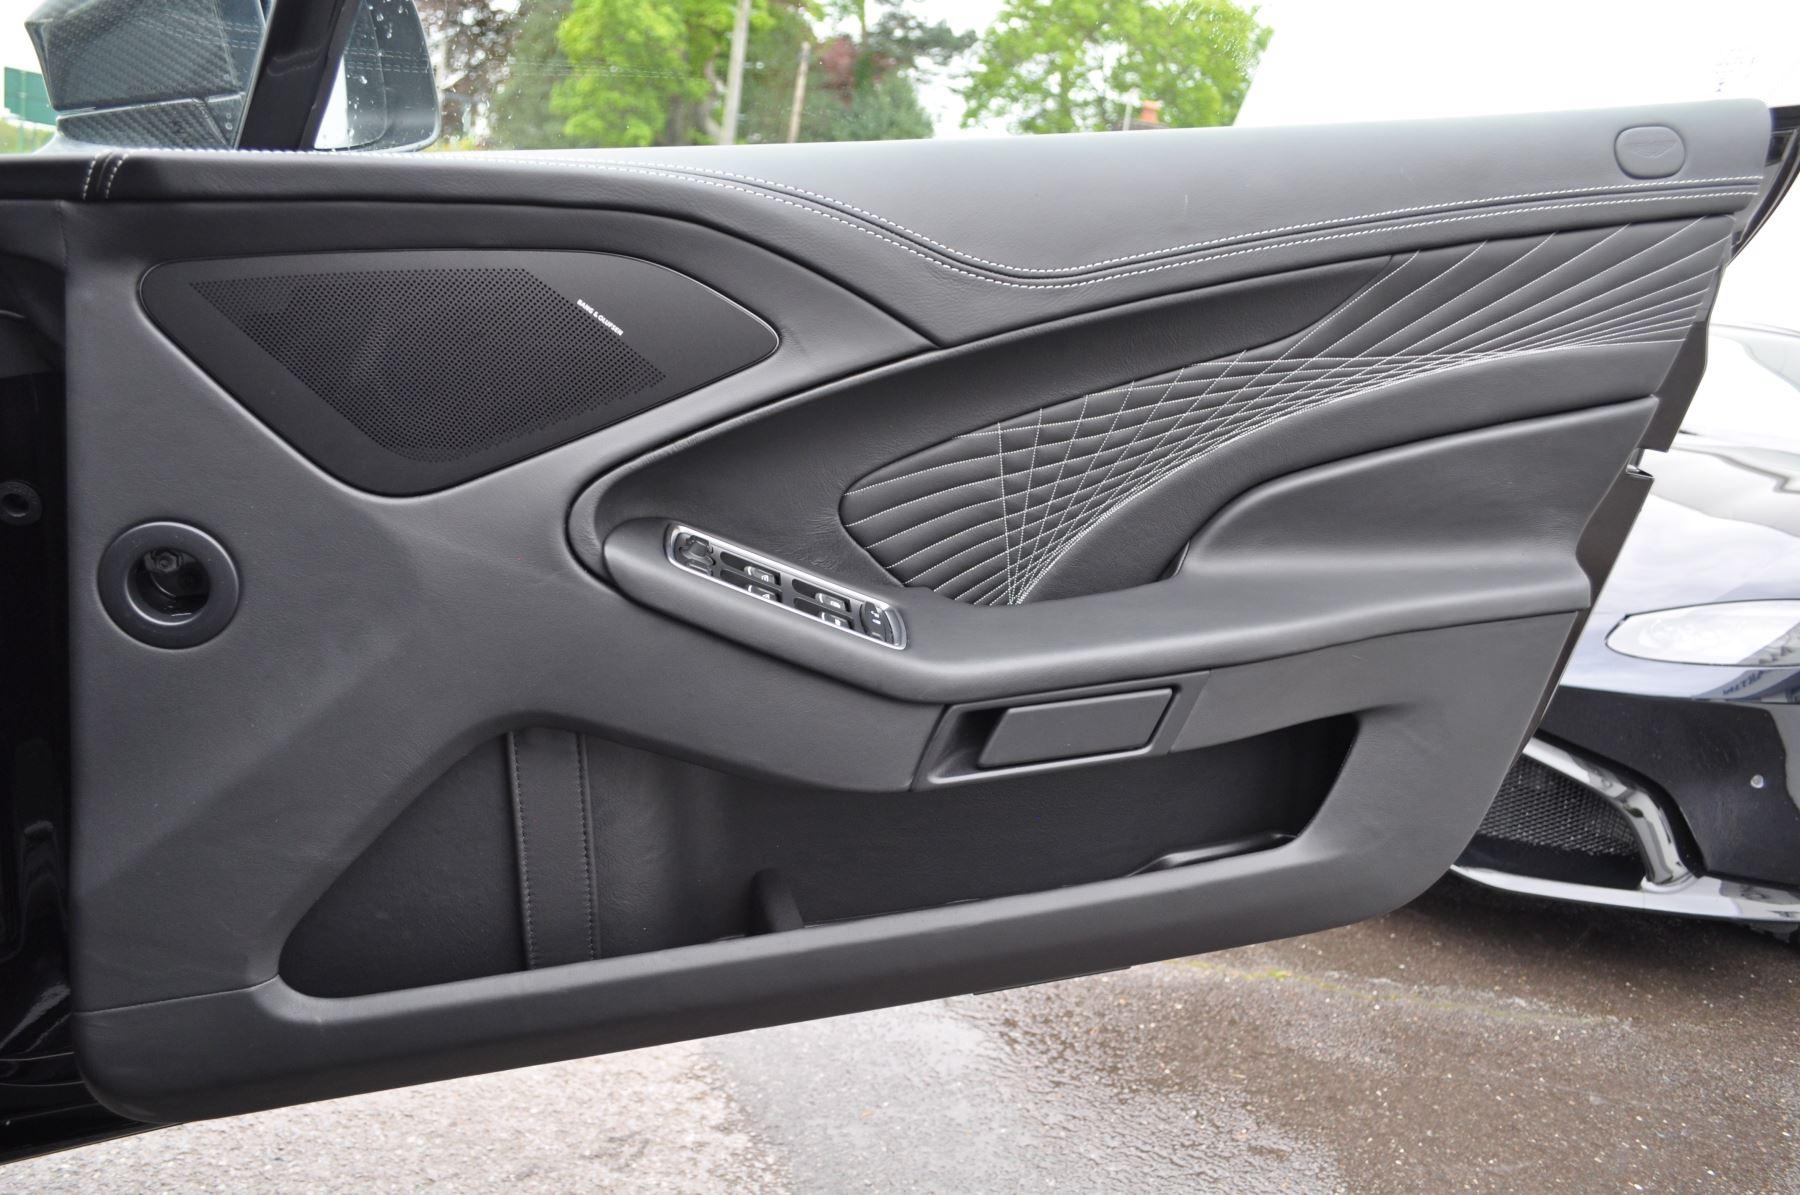 Aston Martin Vanquish S V12 [595] S 2+2 2dr Touchtronic image 28